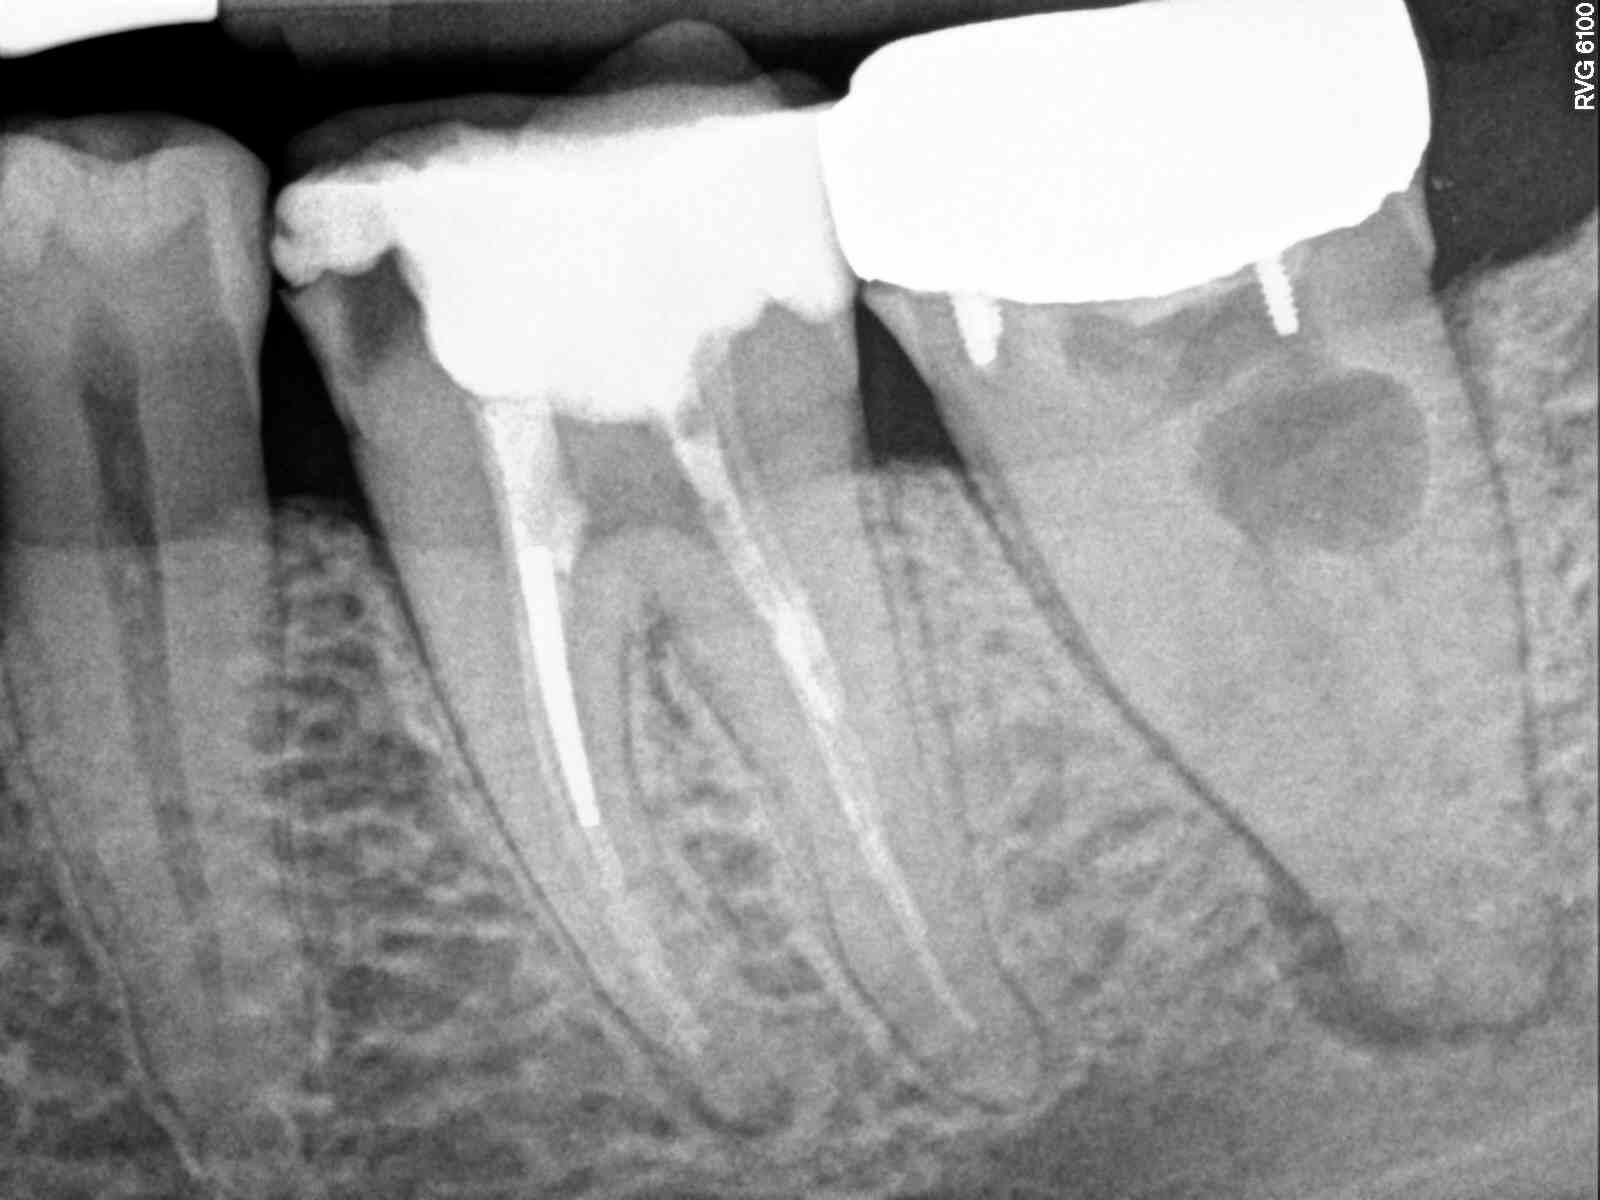 Preserving teeth, pre-operative condition